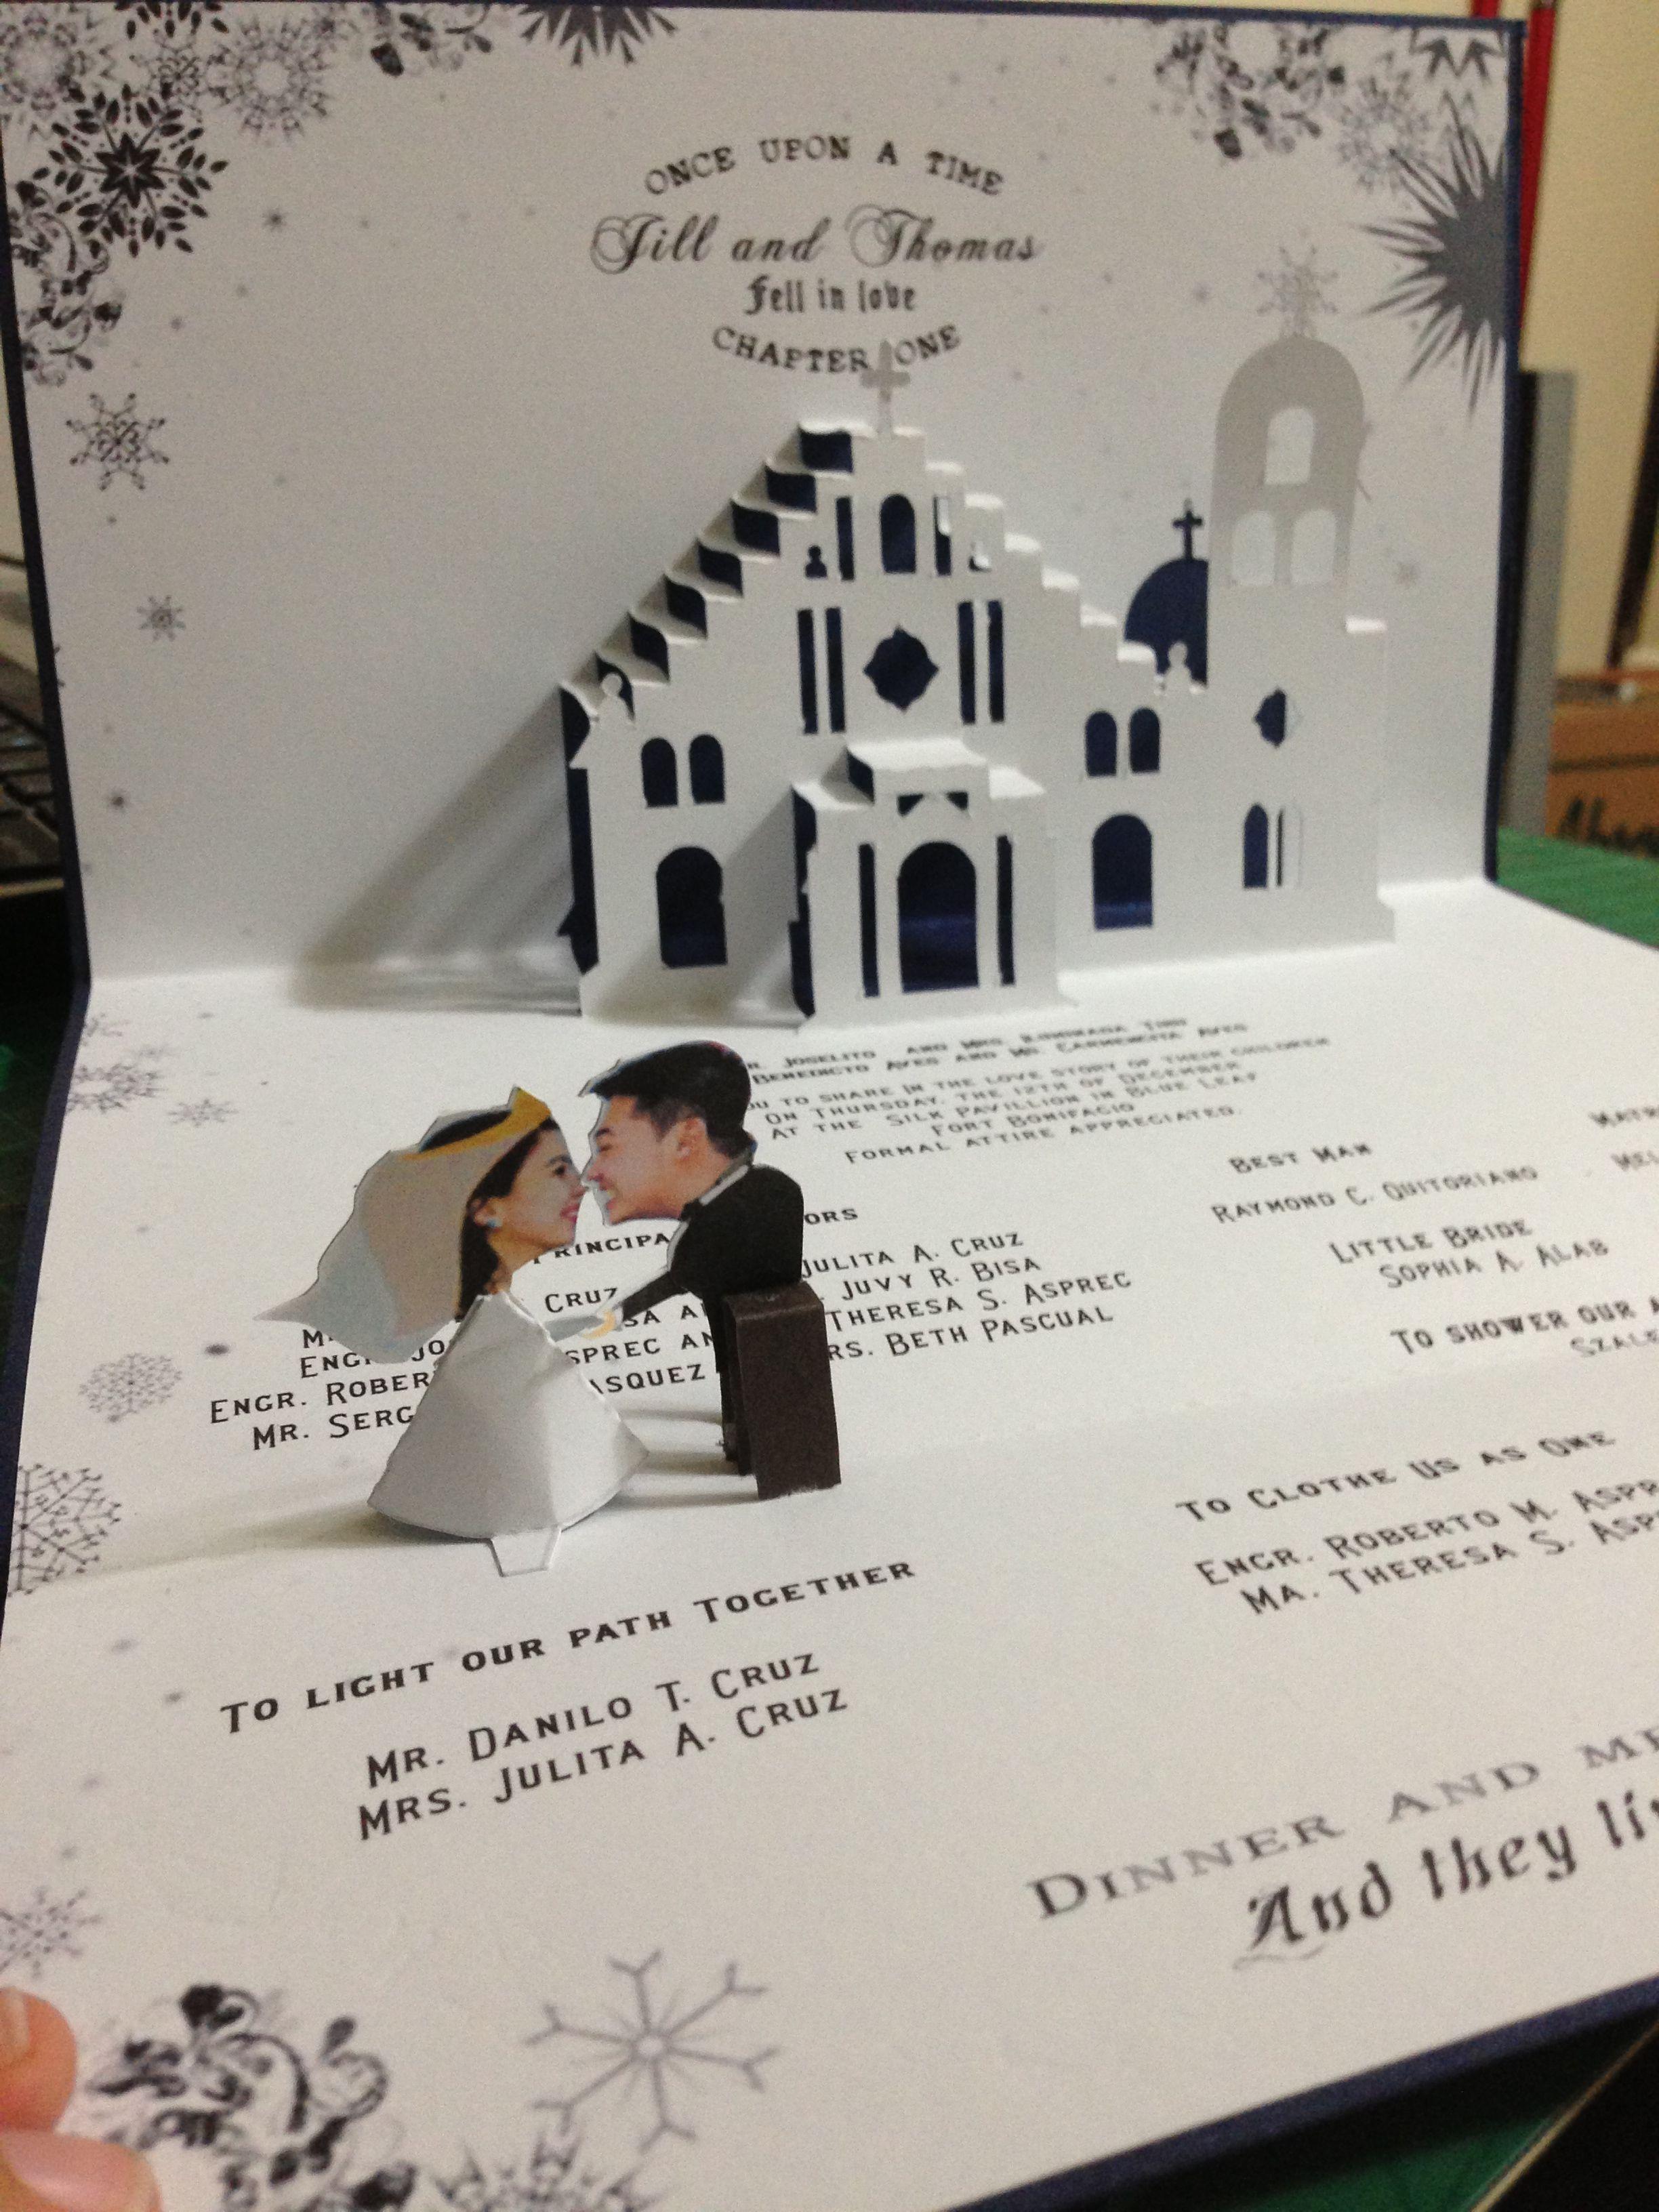 bcca99c2aac419193e48cf0344930765 top invitation planning tips for your wedding wedding, pop up,Pop Up Invitations Wedding